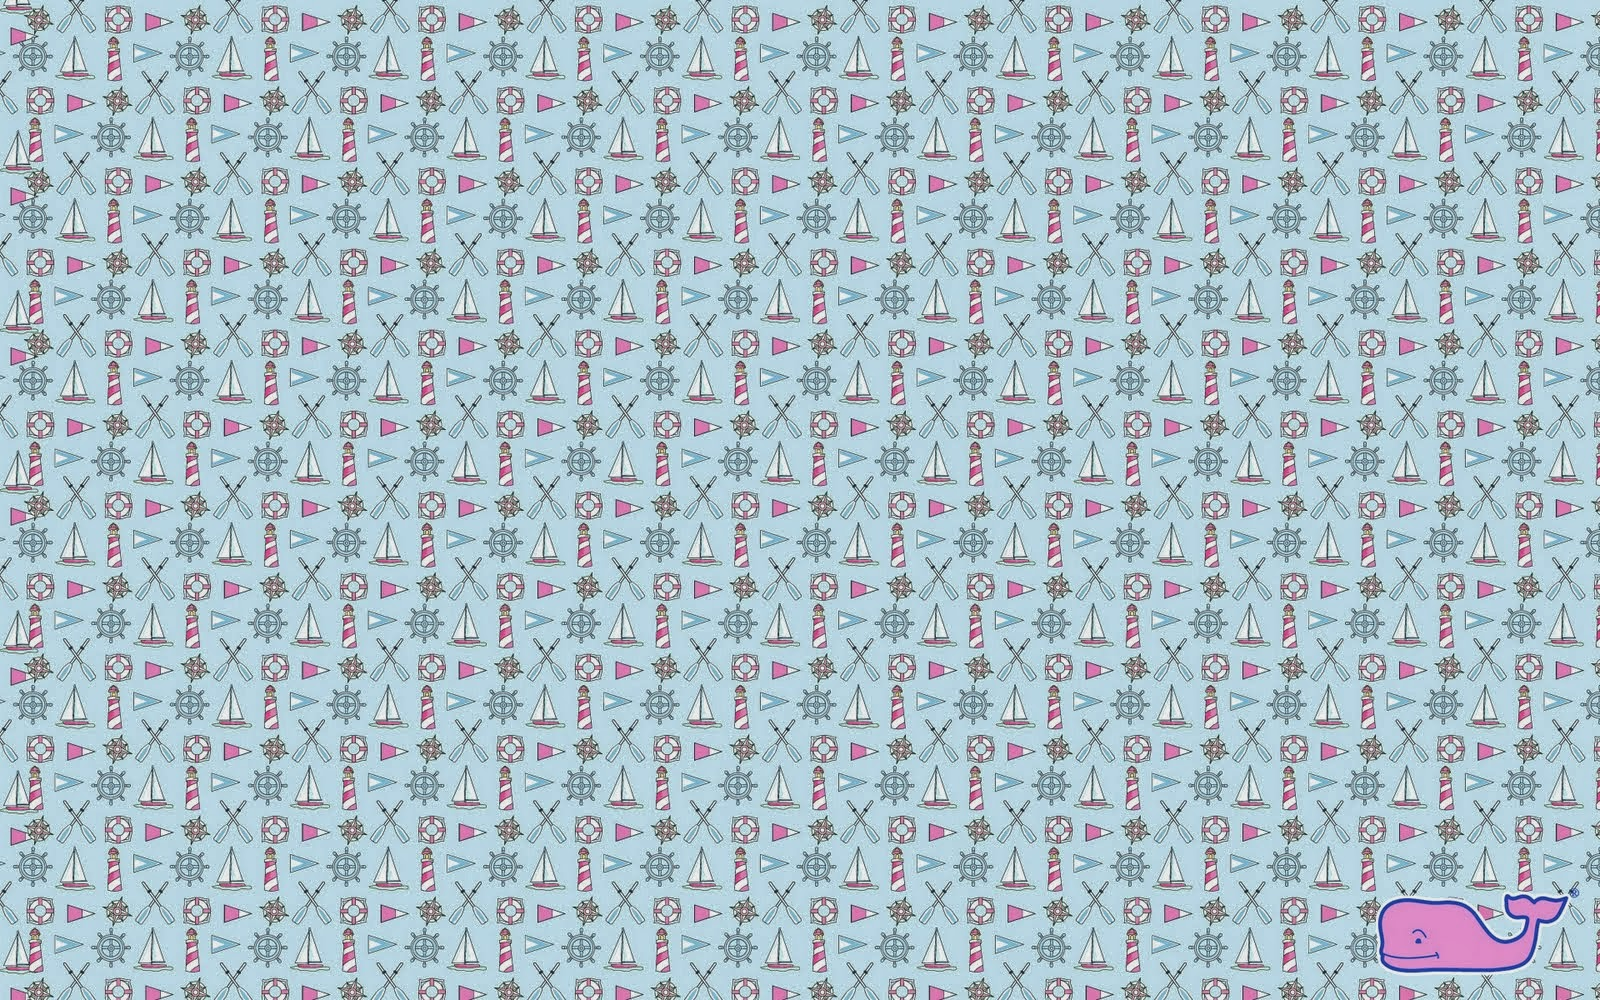 50 Vineyard Vines Desktop Wallpaper On Wallpapersafari